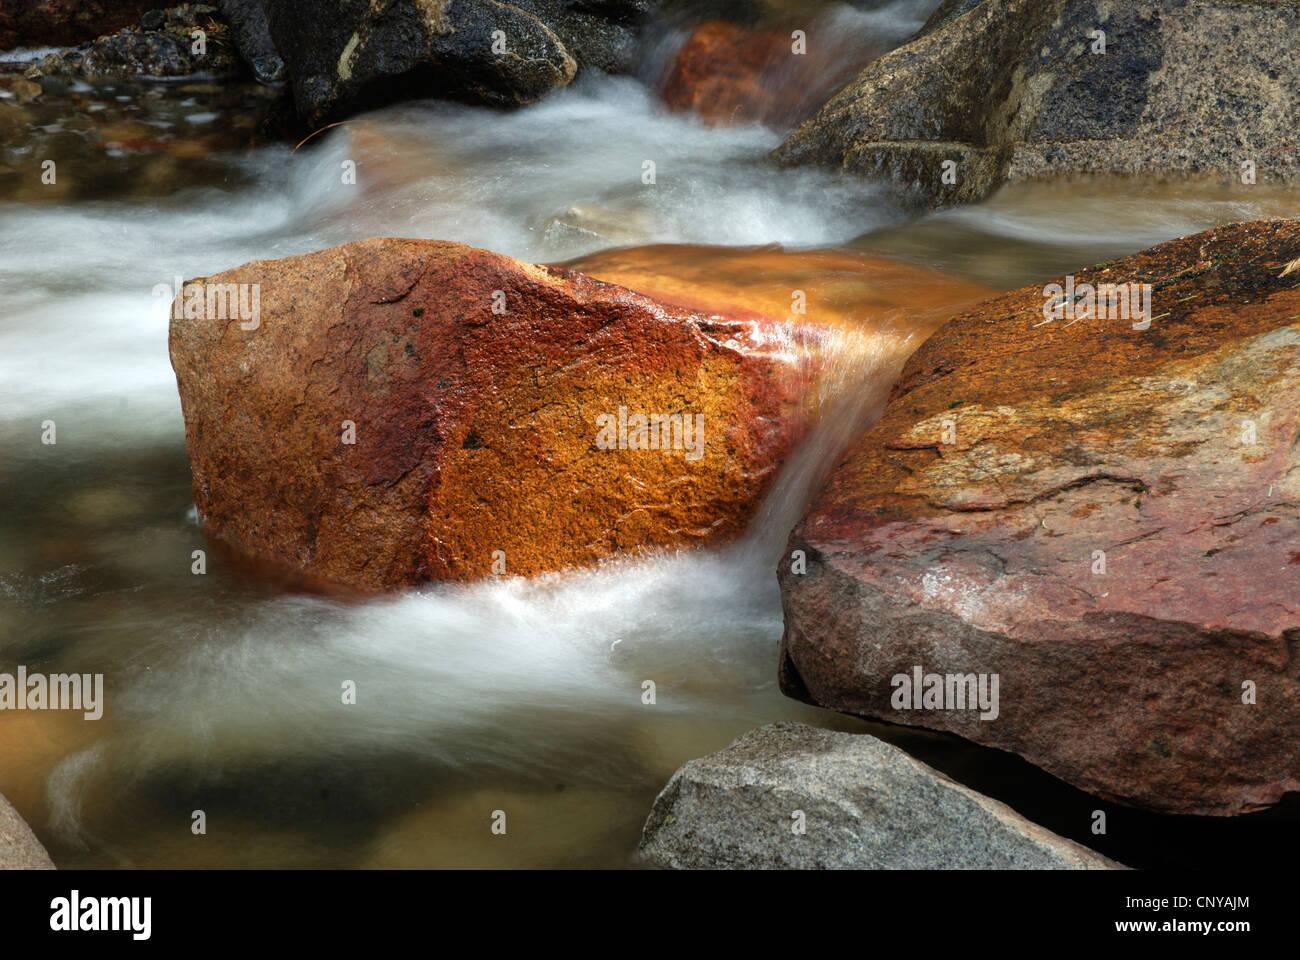 cascading water below Bridal Vail Falls, Yosemite Valley, Yosemite National Park, red stones, soft water - Stock Image